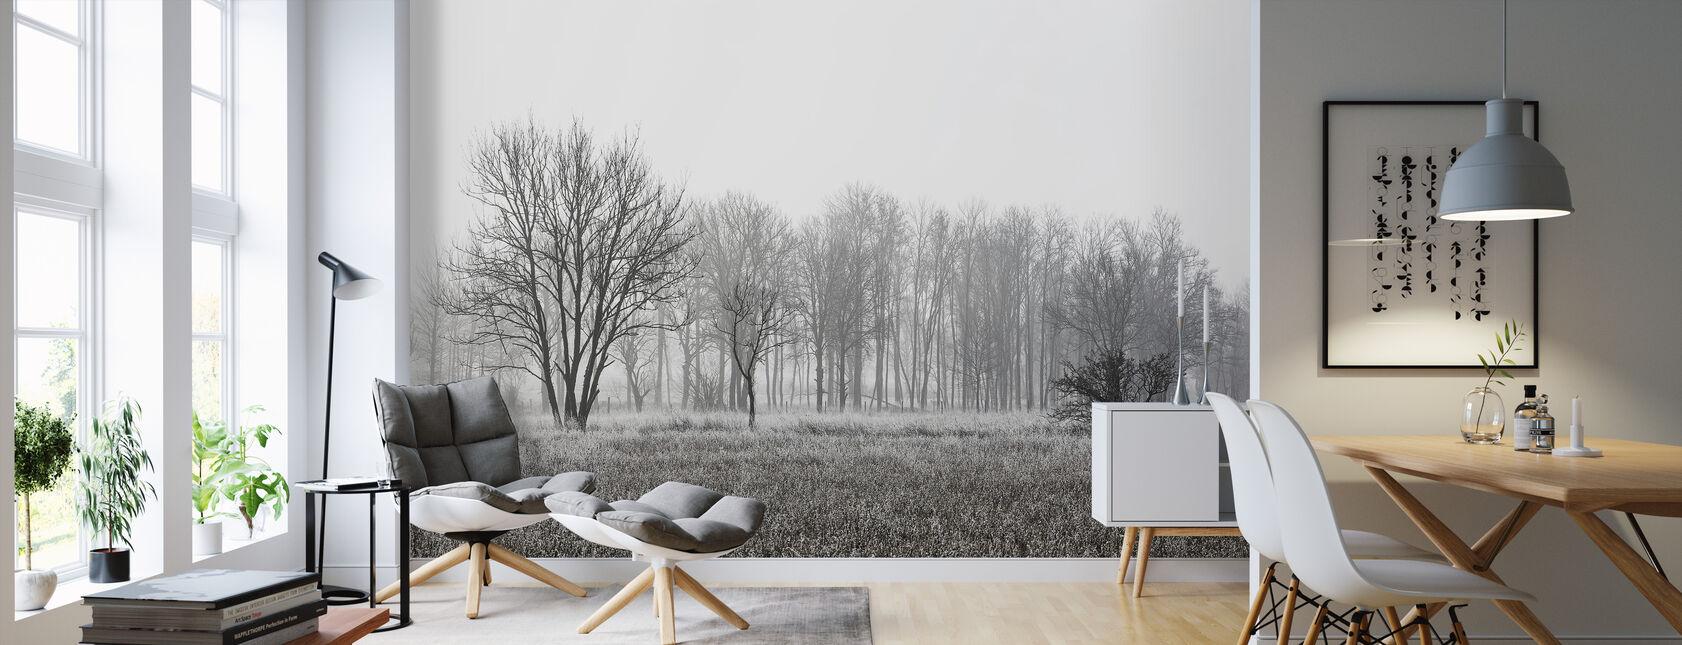 Frosty Morning, black and white - Wallpaper - Living Room